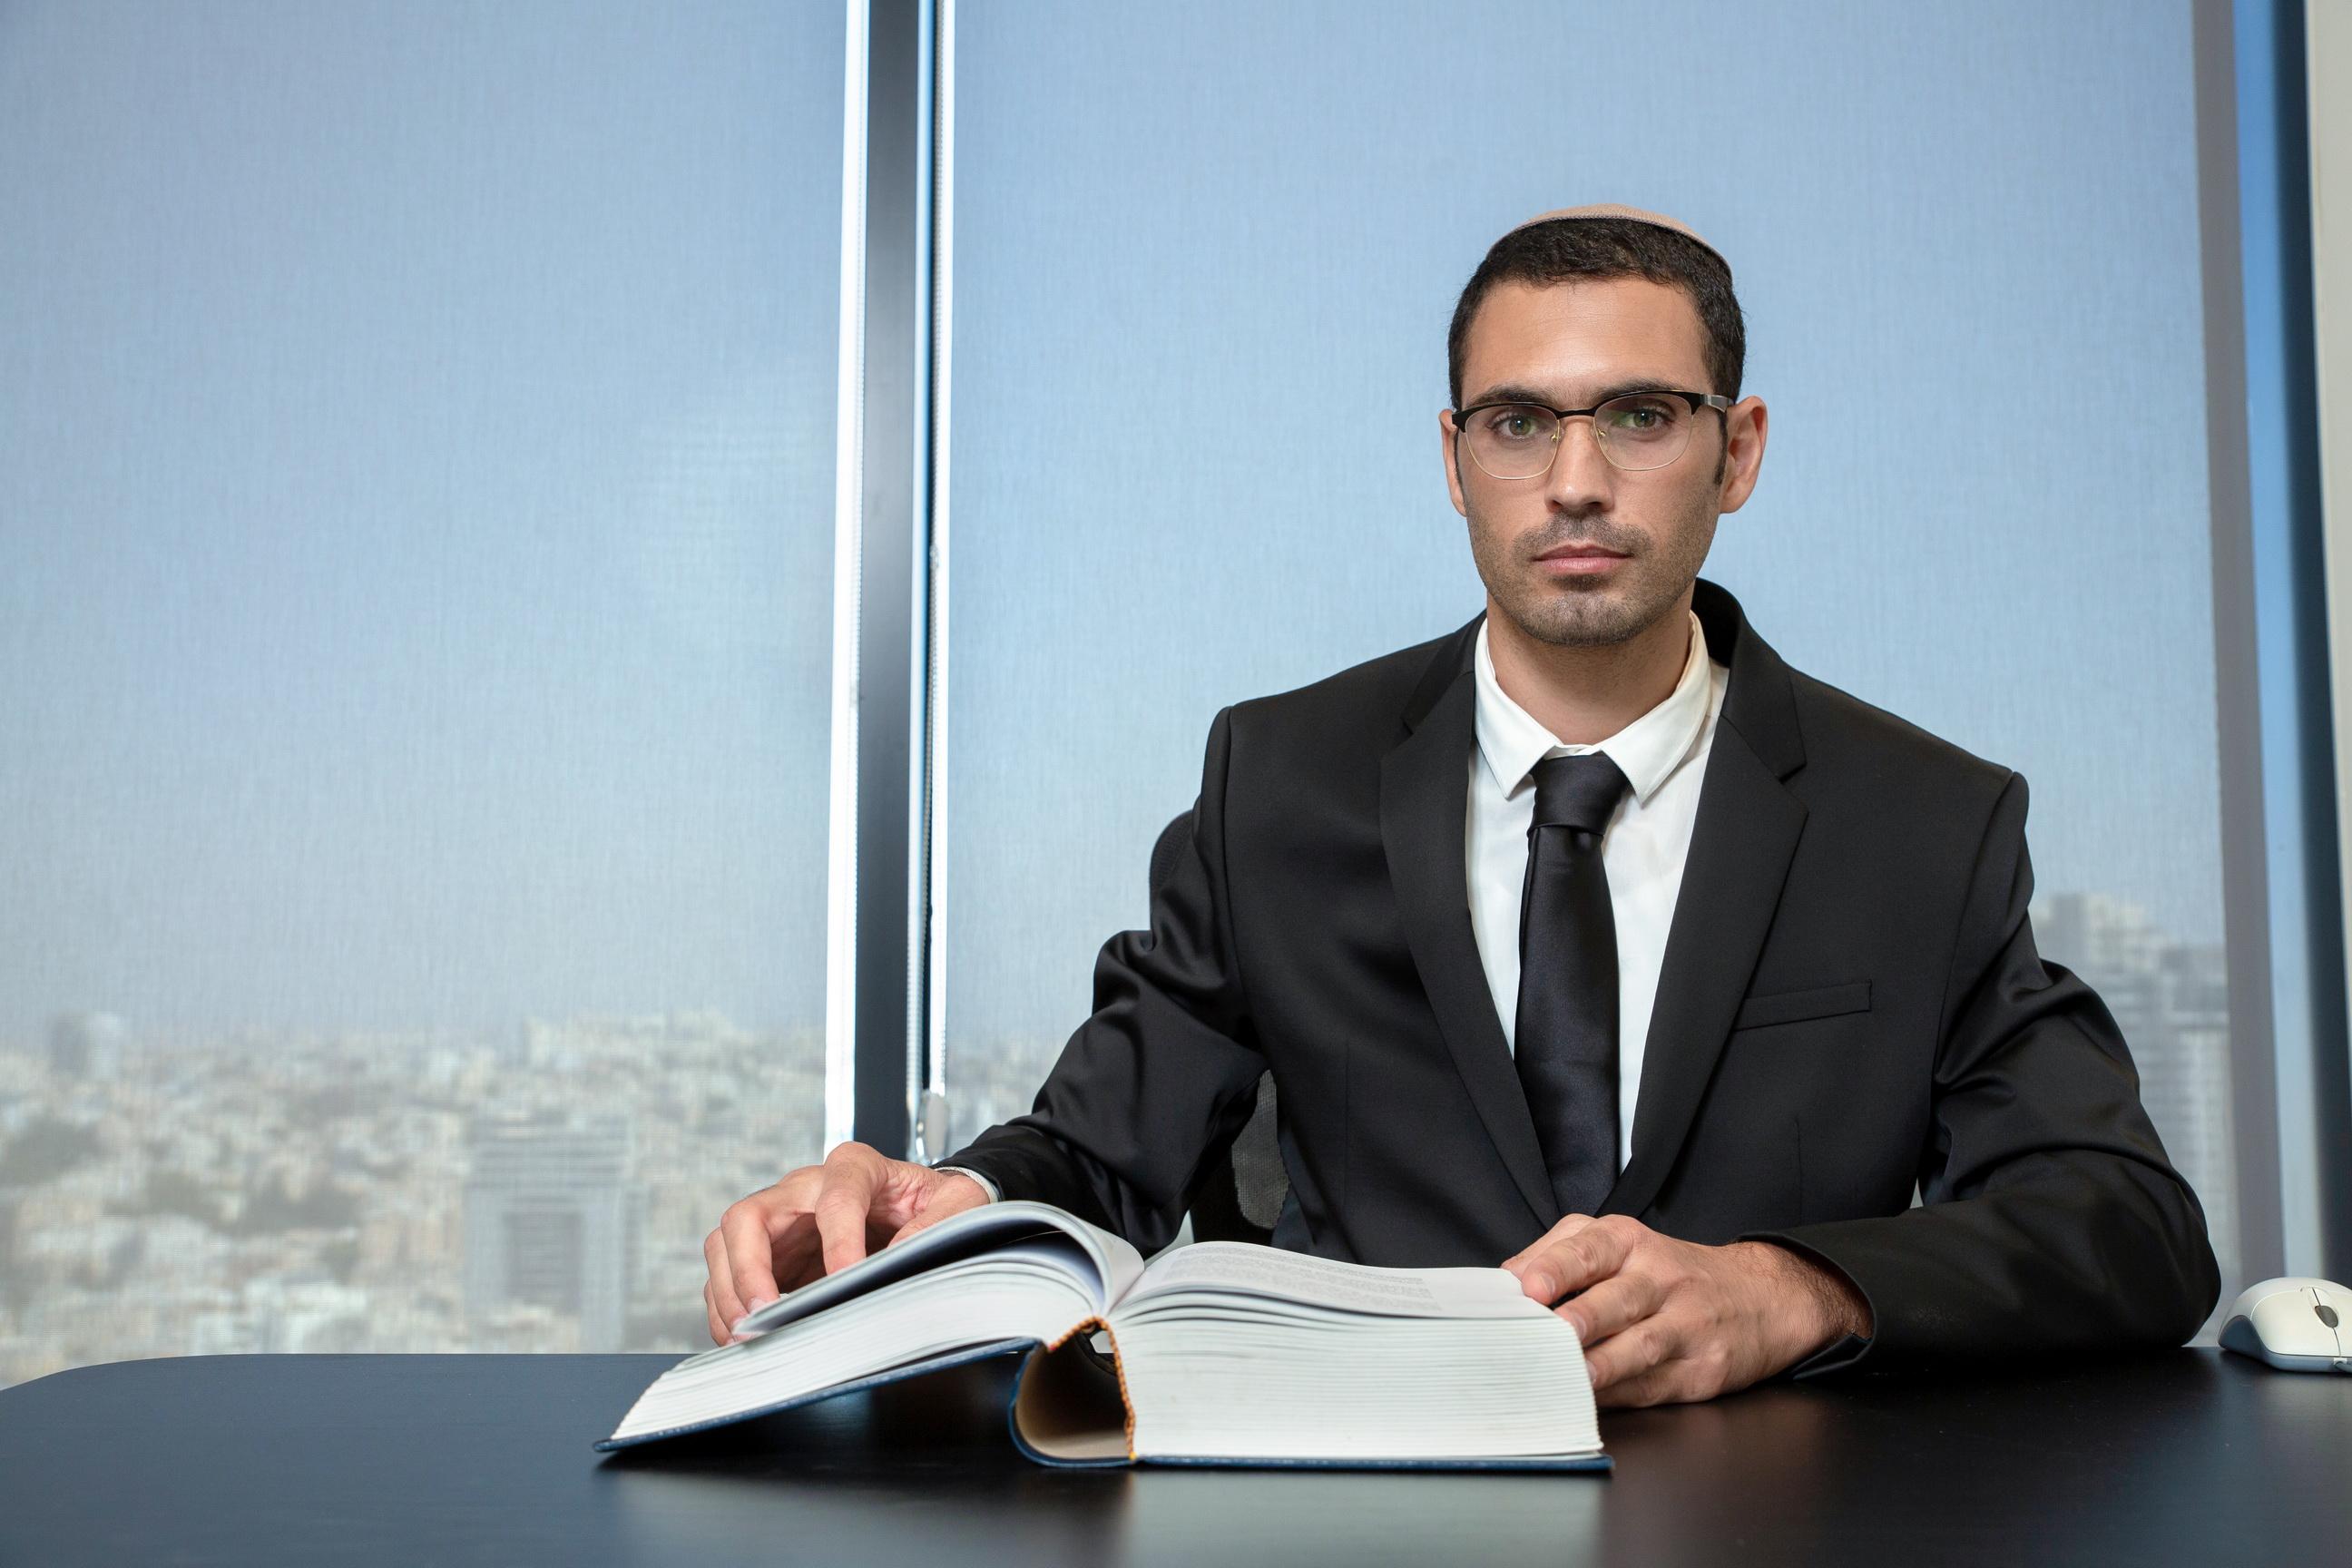 תדמית עורך דין